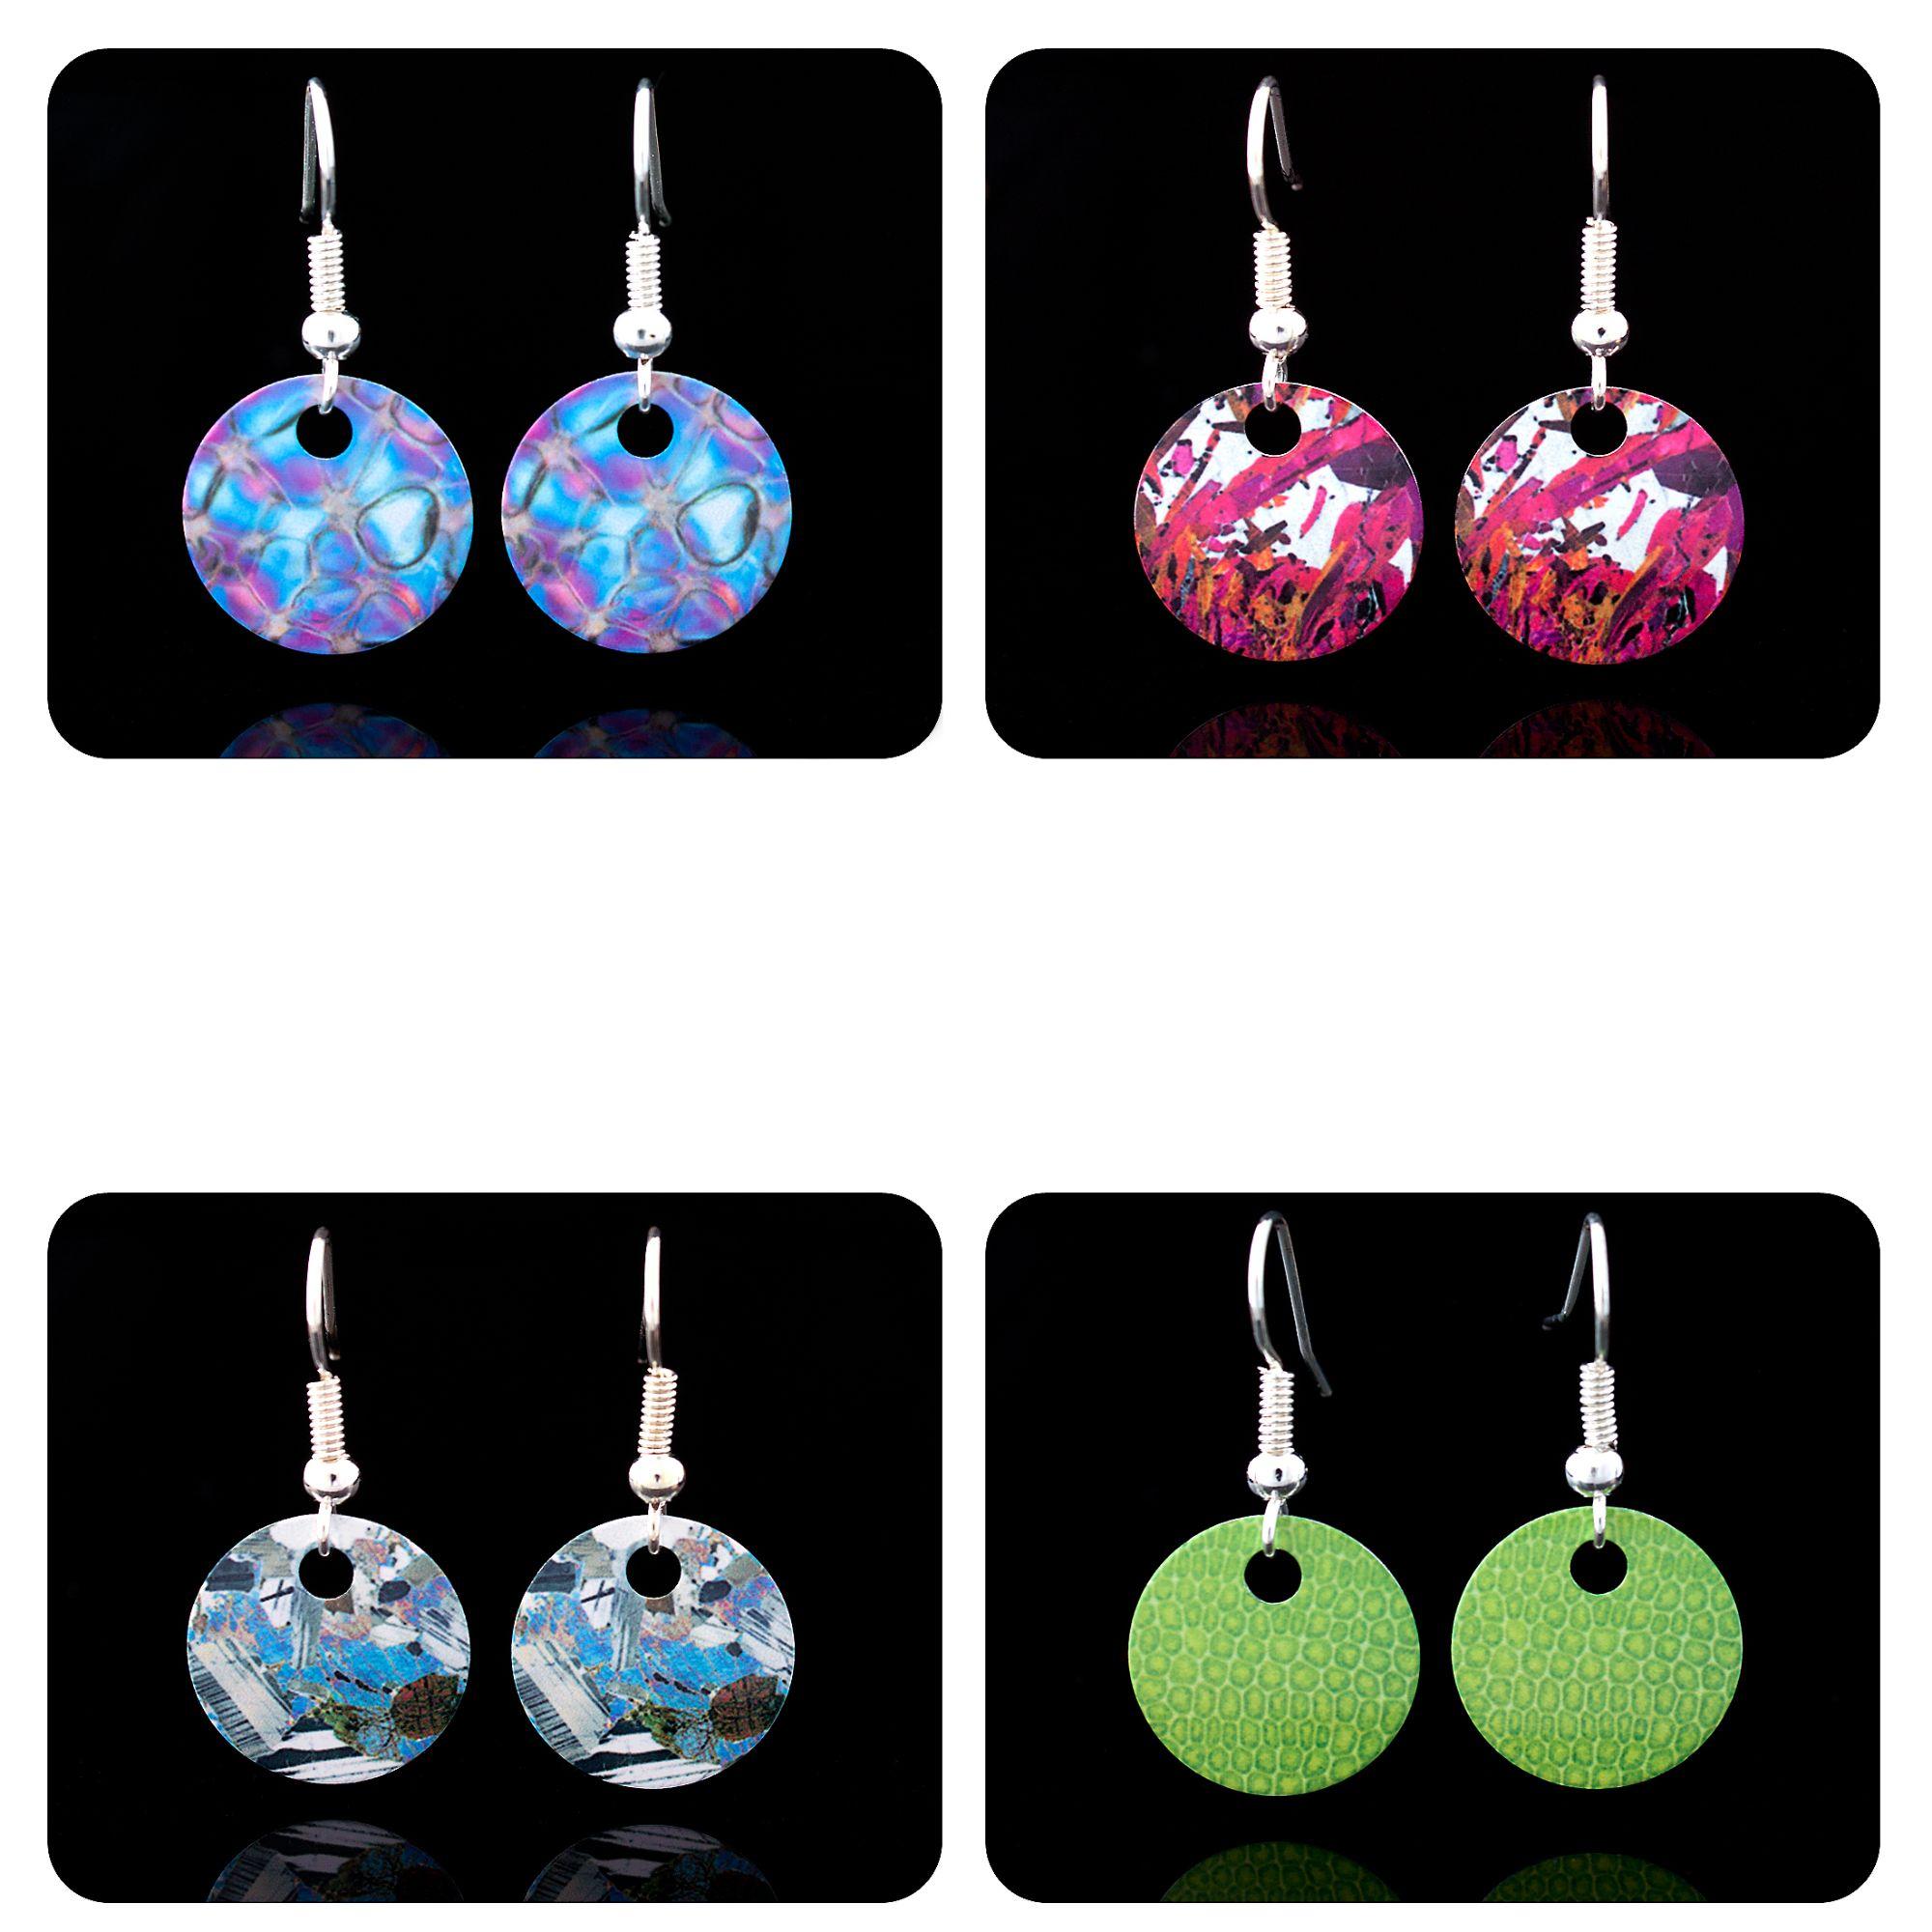 Science earrings